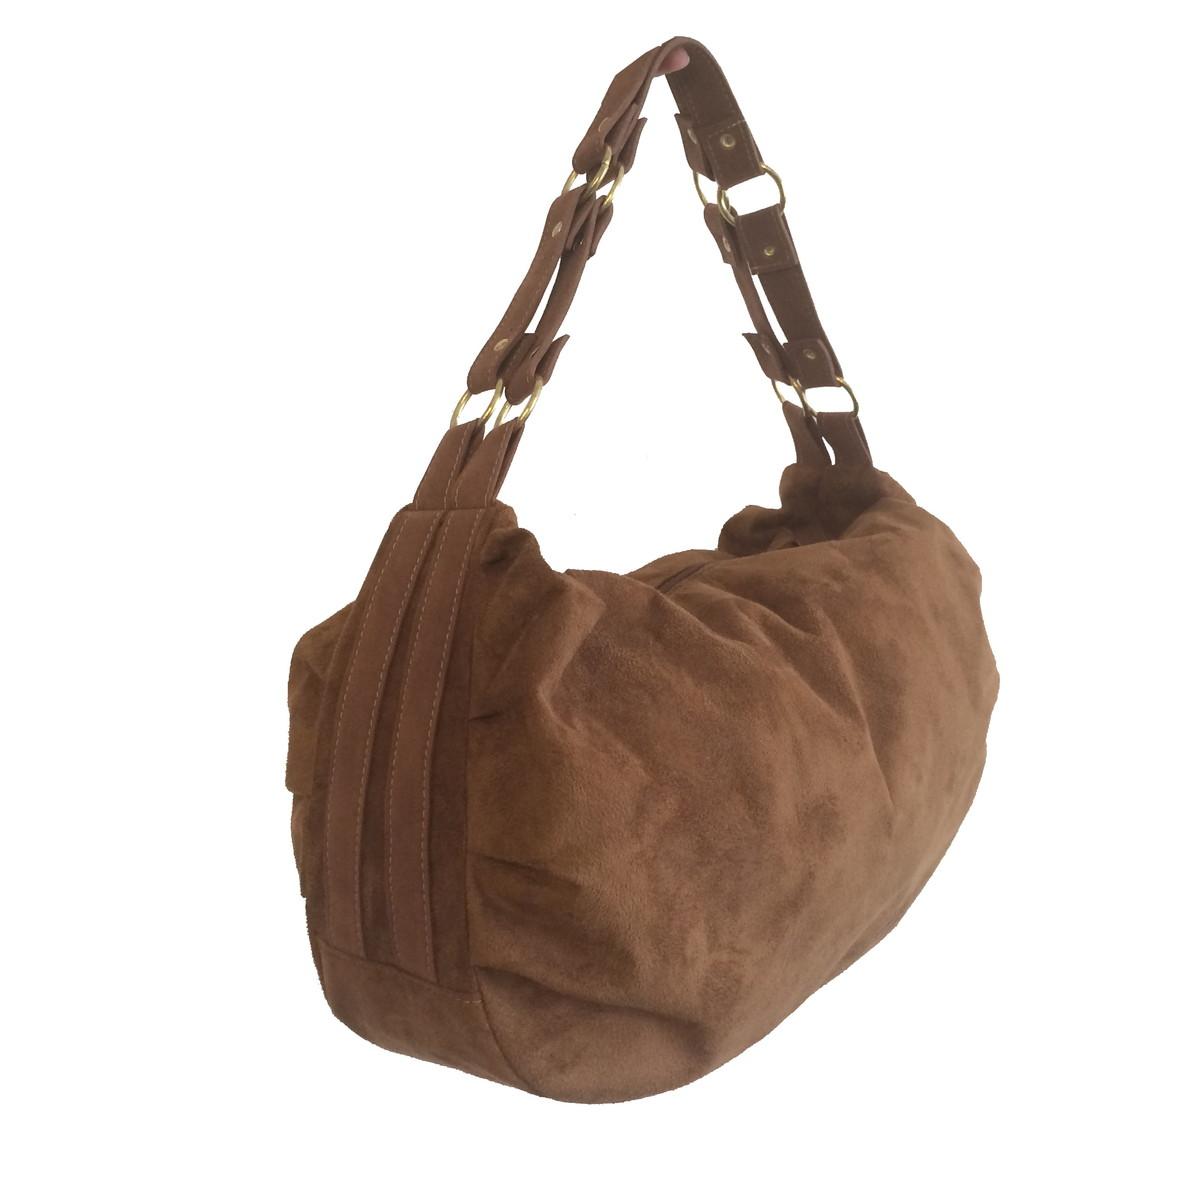 Bolsa Feminina Rusty : Bolsa feminina saco camur?a grande linda meu tio que fez